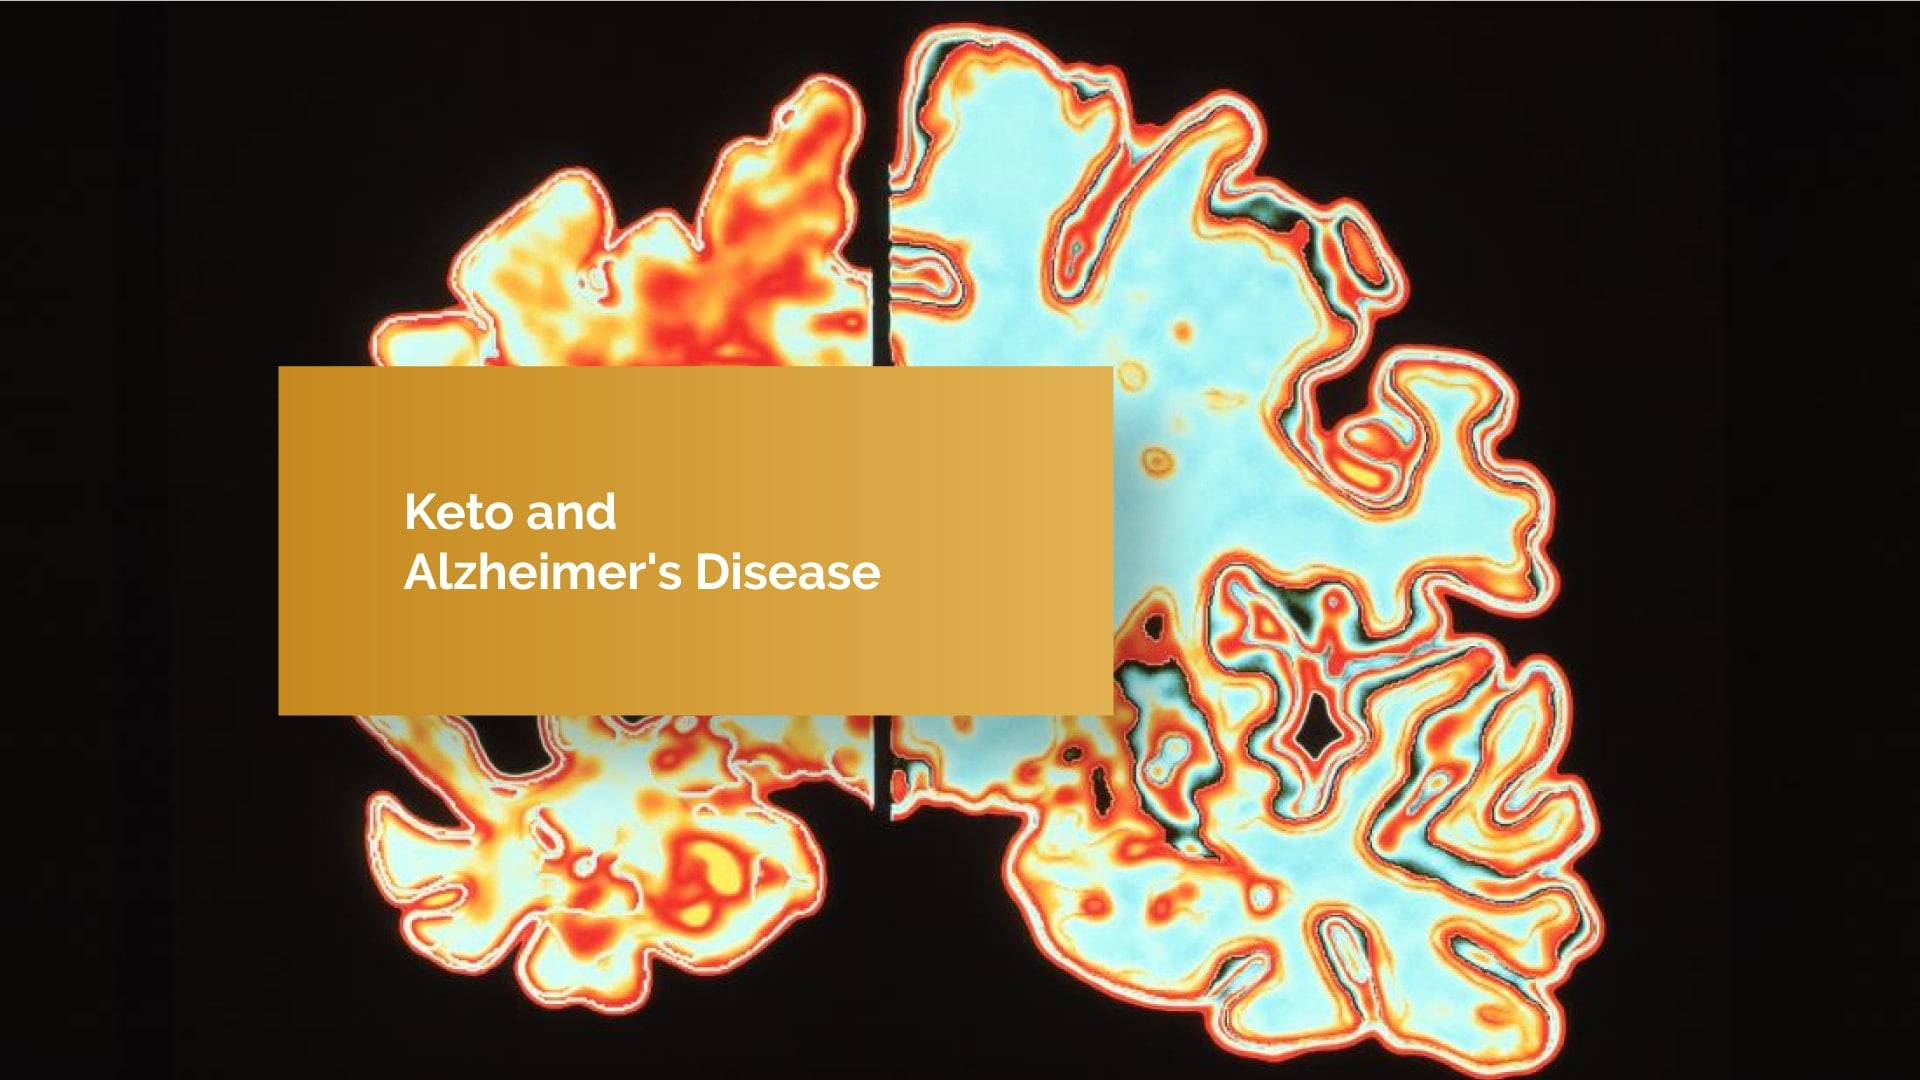 Keto Diet and Alzheimer's Disease